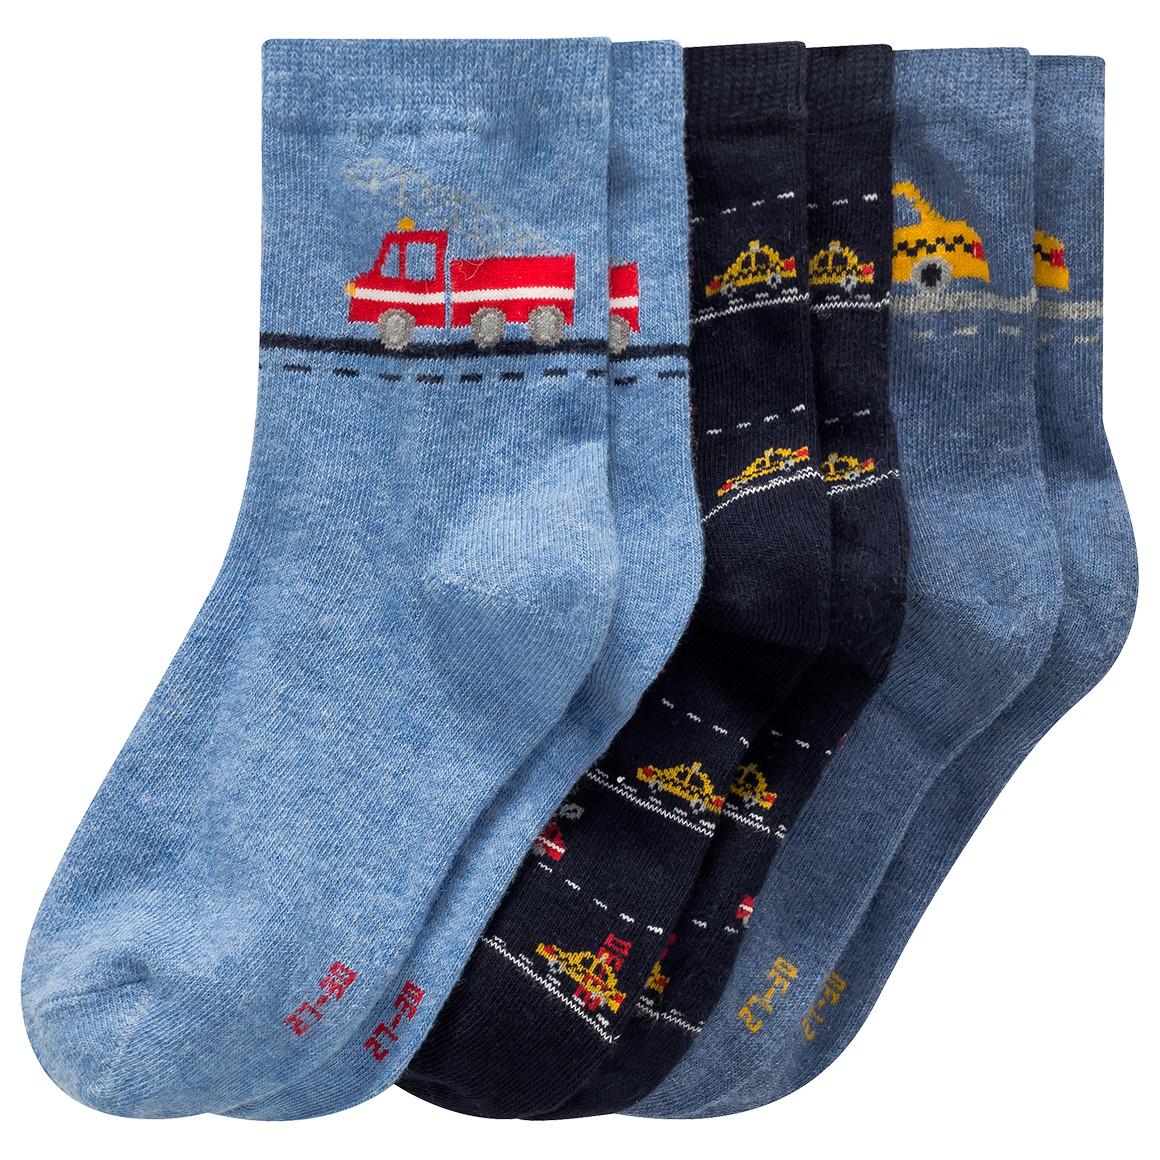 Miniboyaccessoires - 3 Paar Jungen Socken mit Auto Motiven - Onlineshop Ernstings family